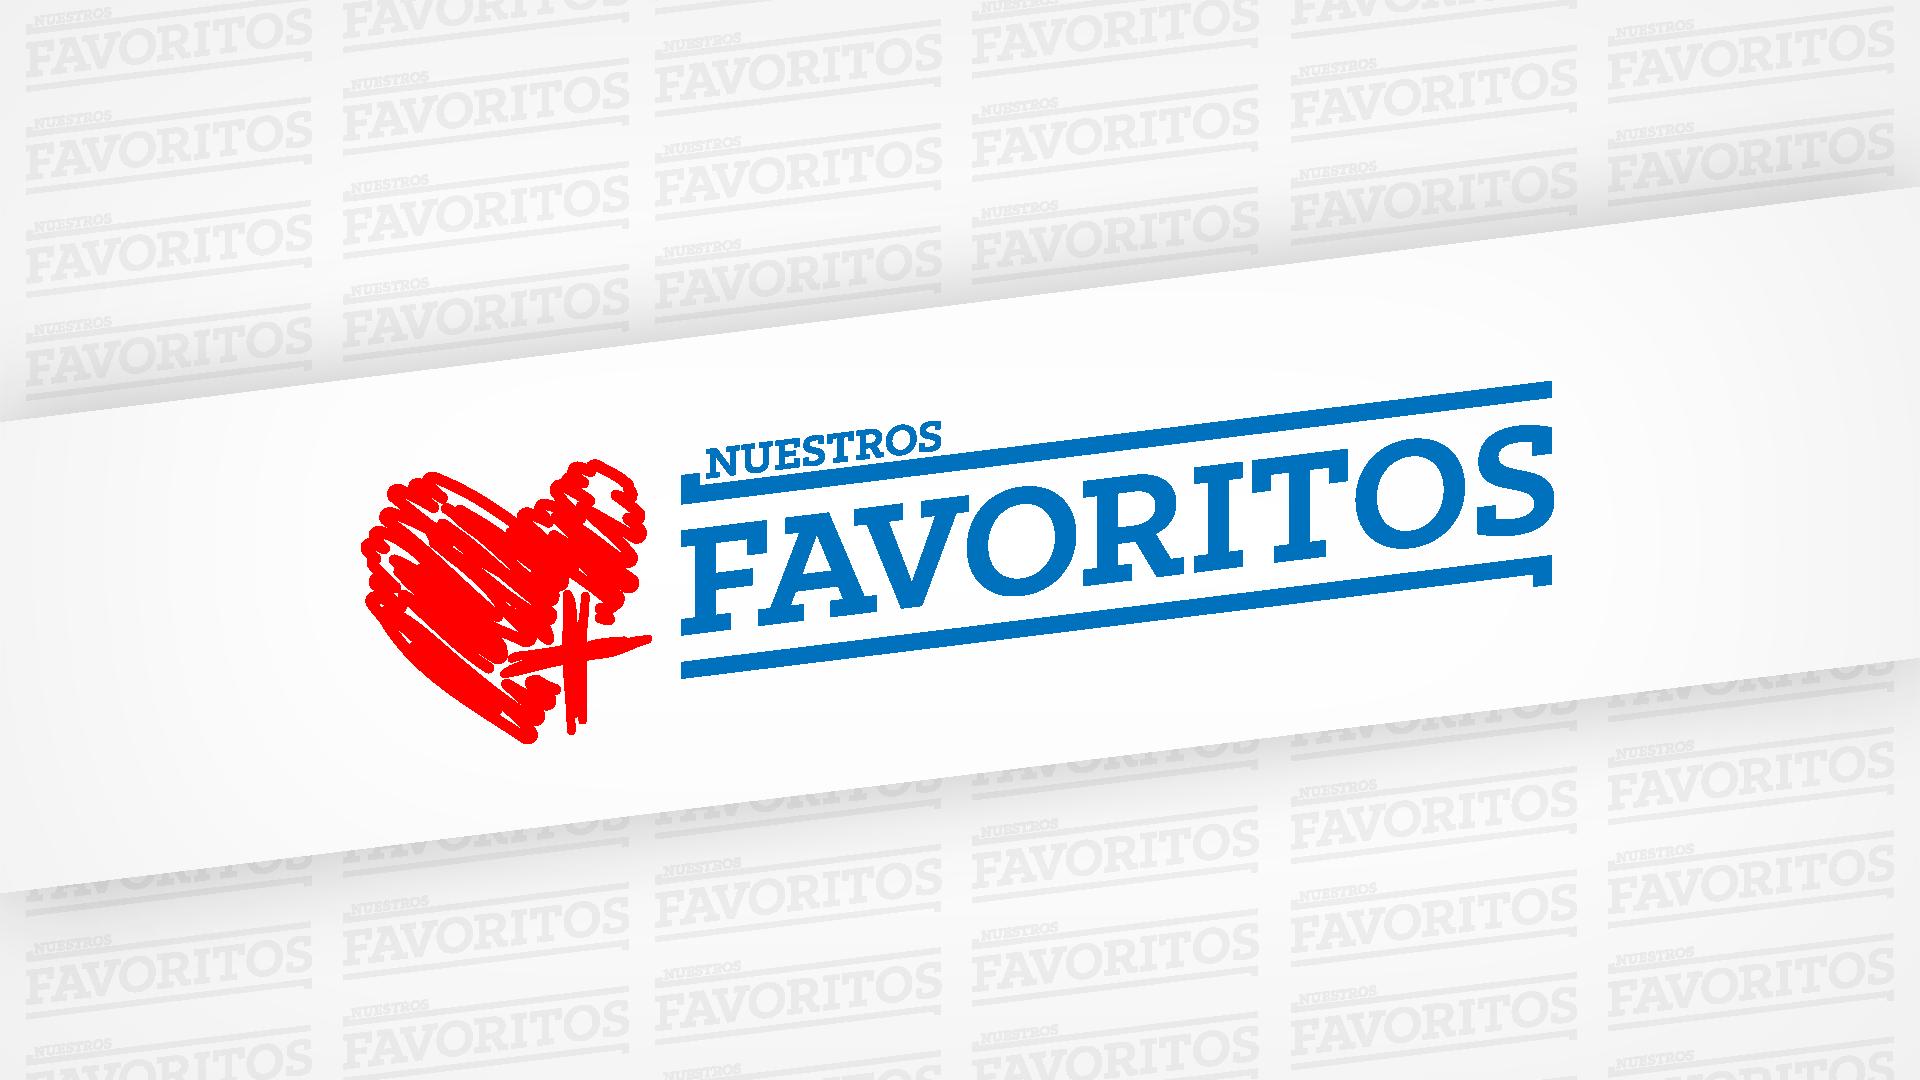 Favorites-Series-Image-esp